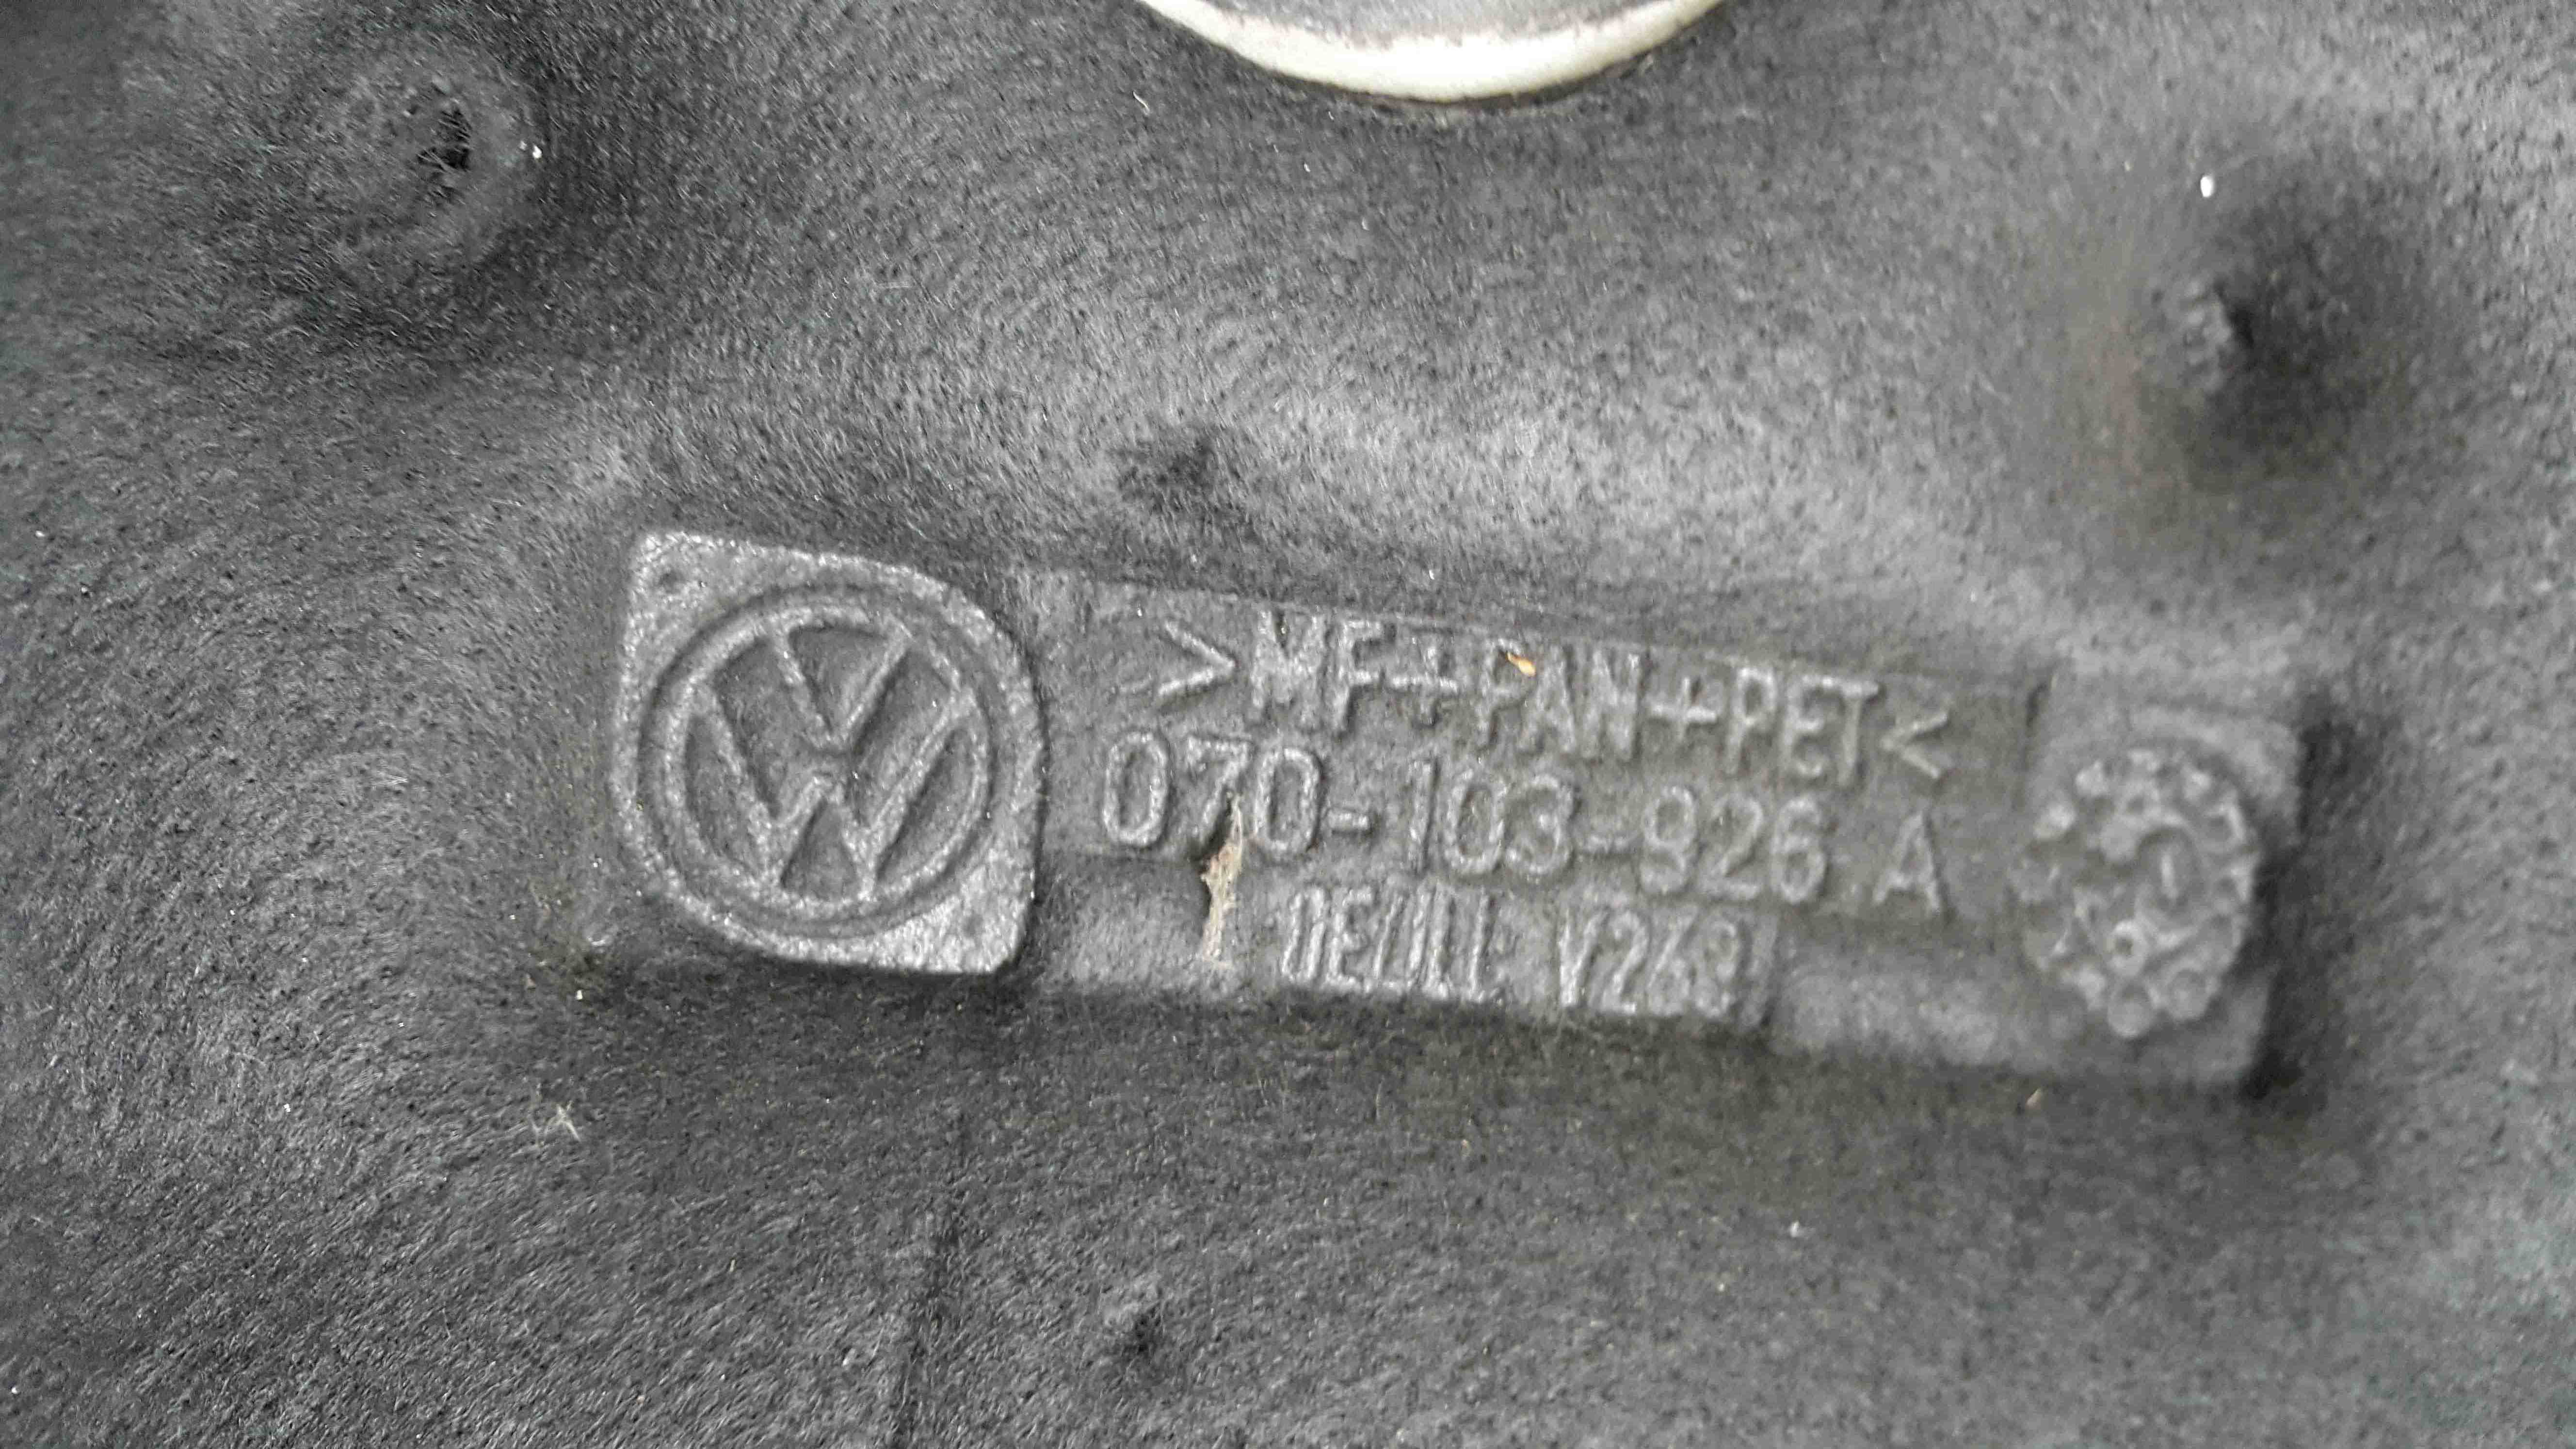 Volkswagen Touareg 2002-2007 2.5 TDi Engine Cover Plastic 070103926A